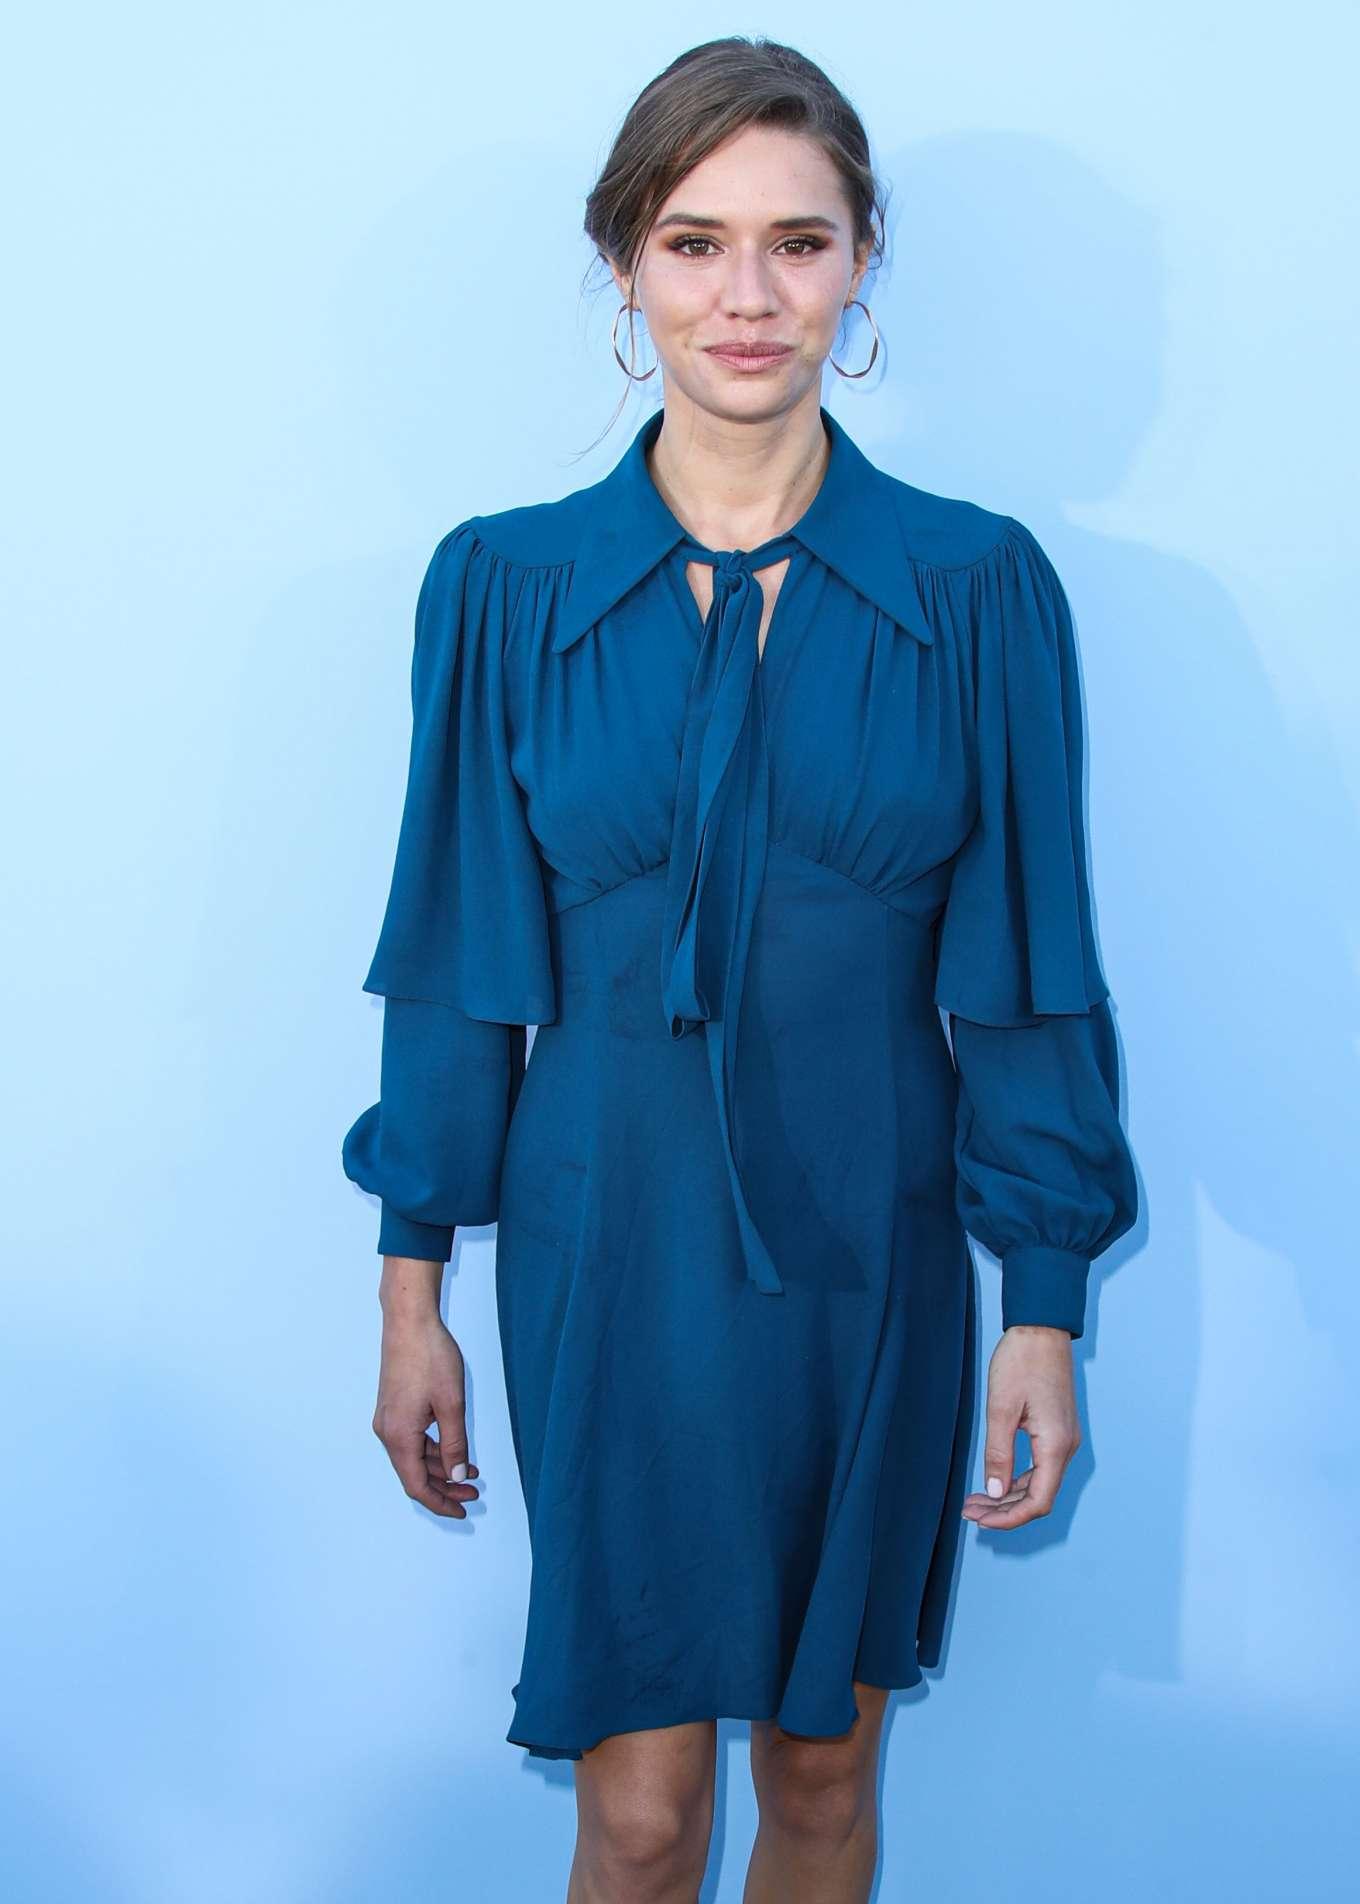 Alessandra Balazs 2019 : Alessandra Balazs – Michael Kors show – New York Fashion Week-04